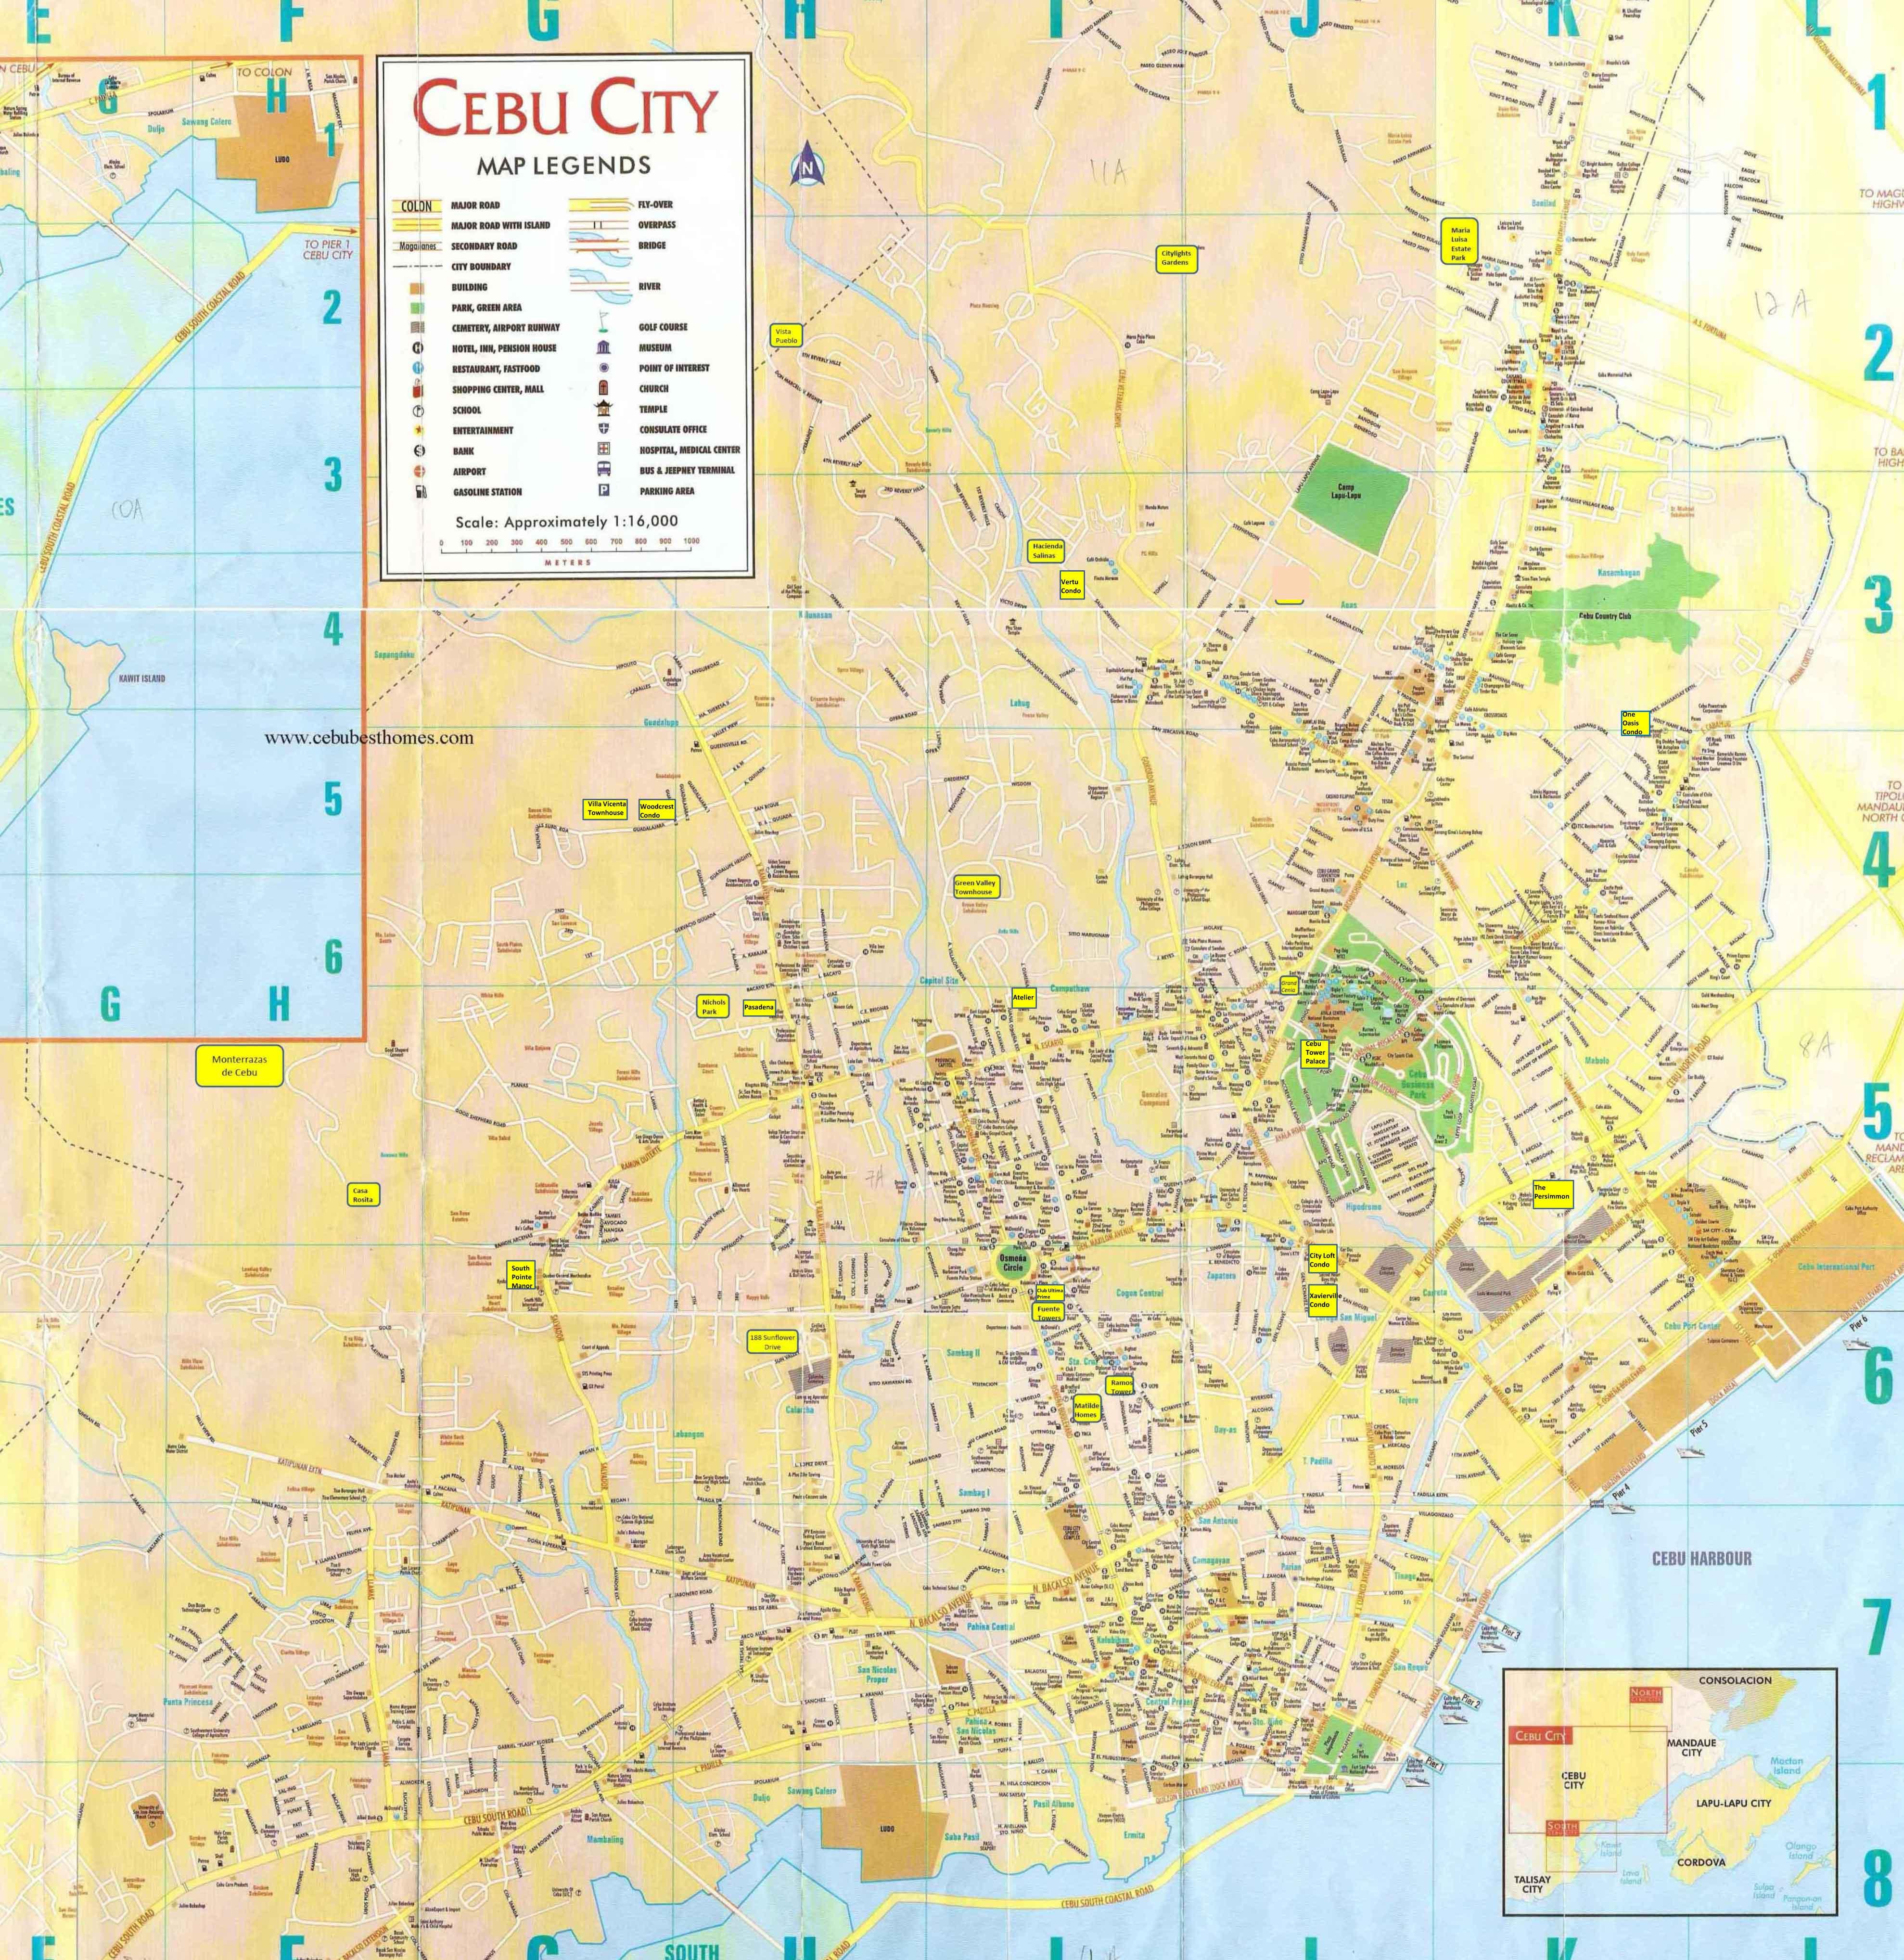 Street Map Australia.City Maps Stadskartor Och Turistkartor Australia Cambodia Etc